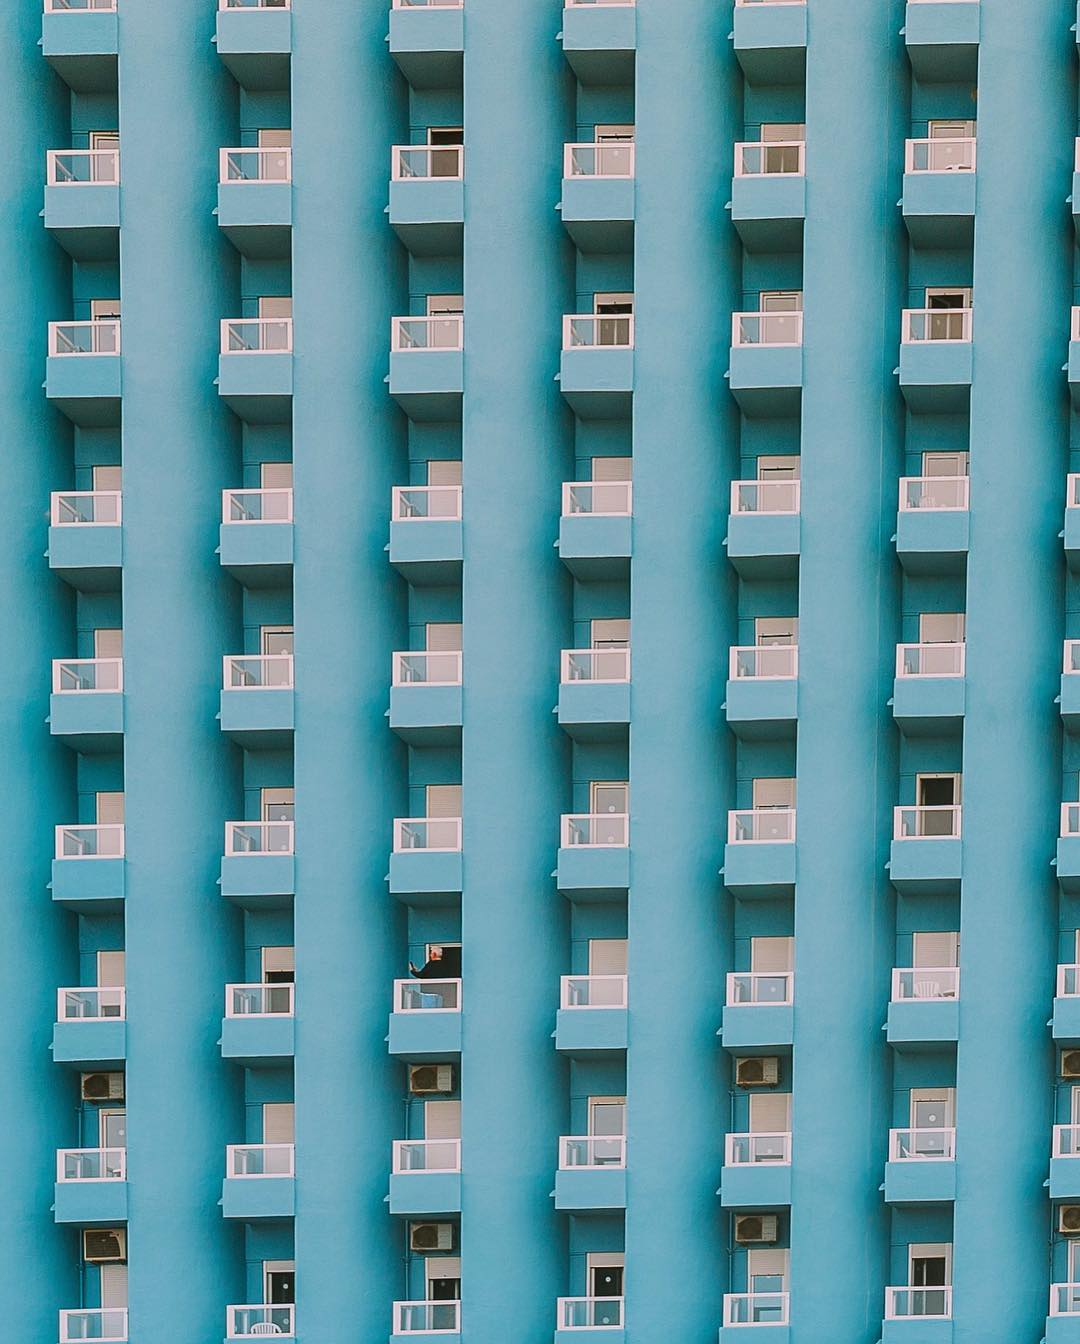 fotografo Joaquin Lucas paleta de colores de Wes Anderson  (9)